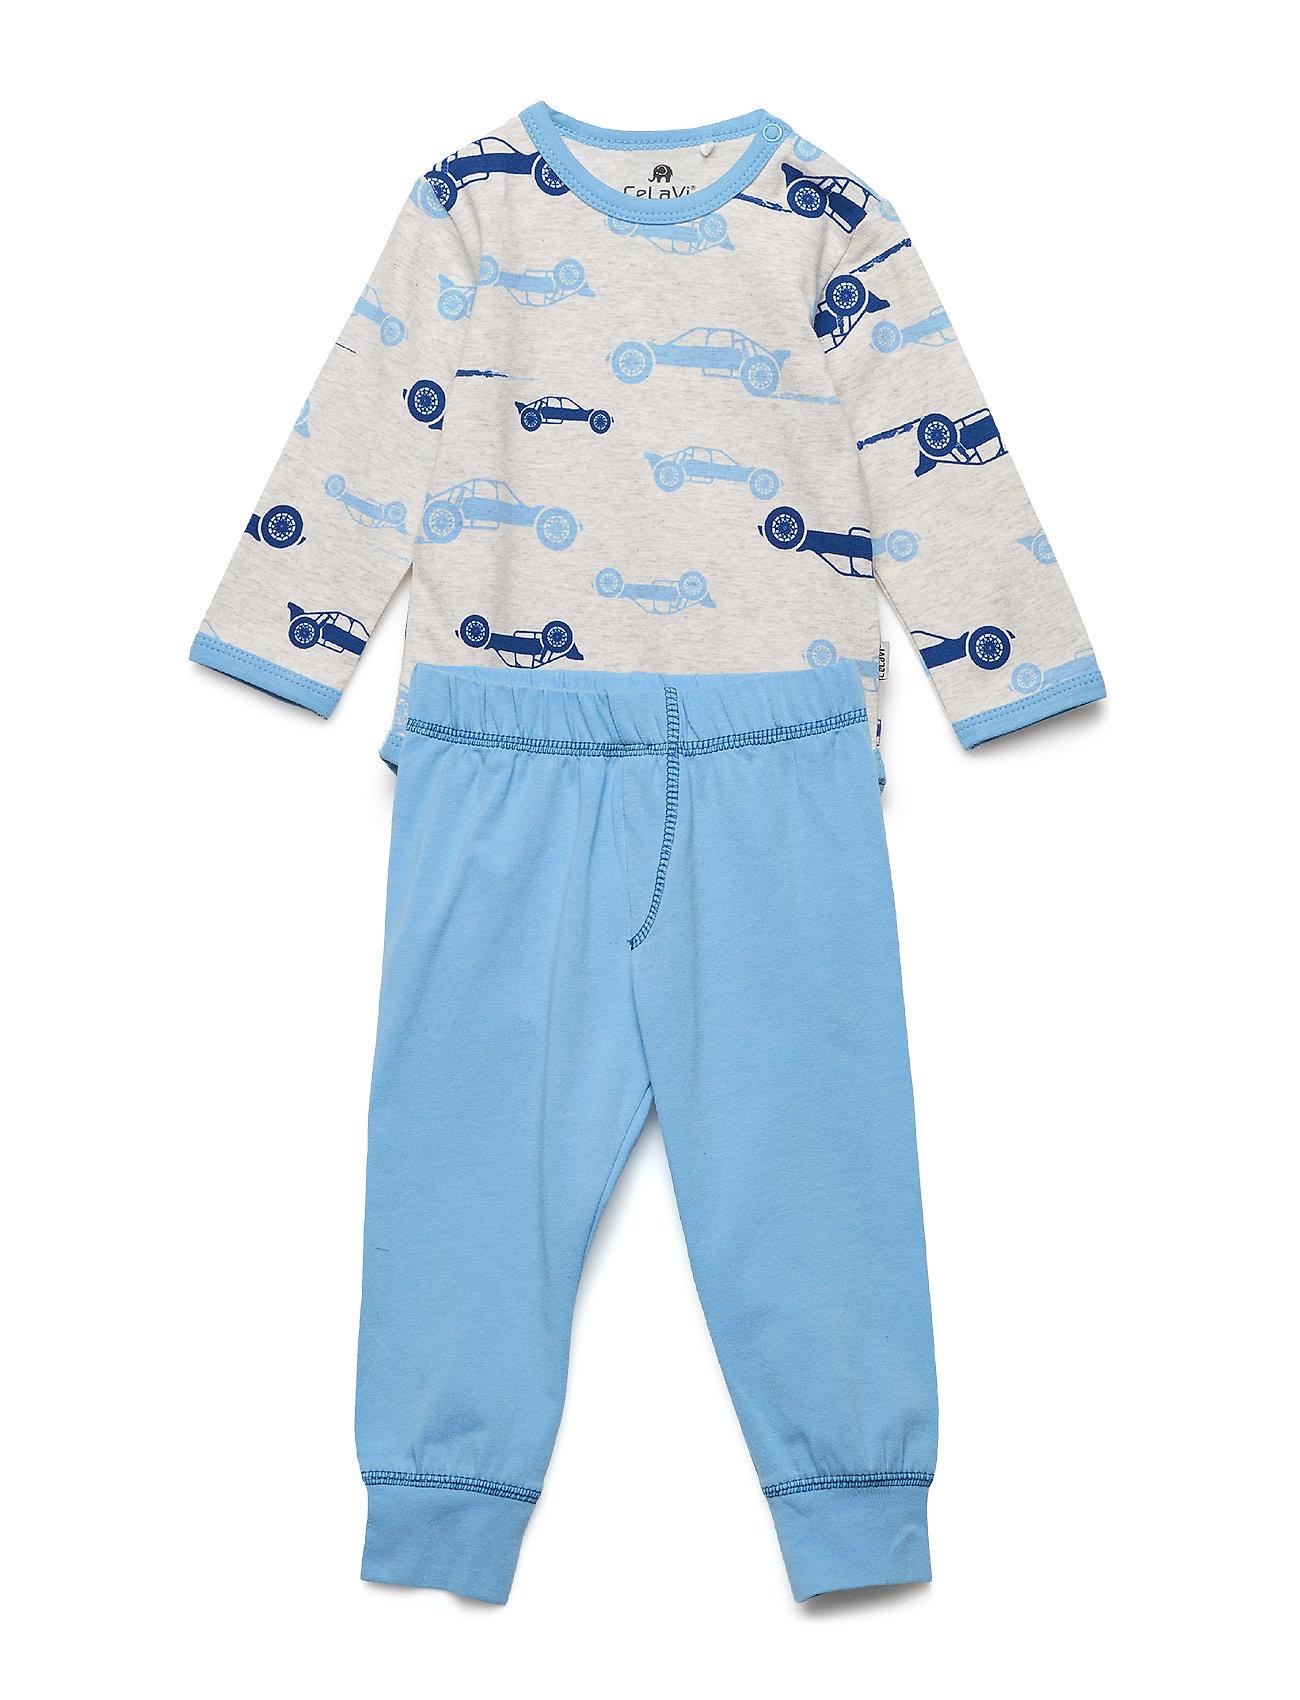 CeLaVi Baby Pyjamas Set - AOP - OFFWHITE MELANGE